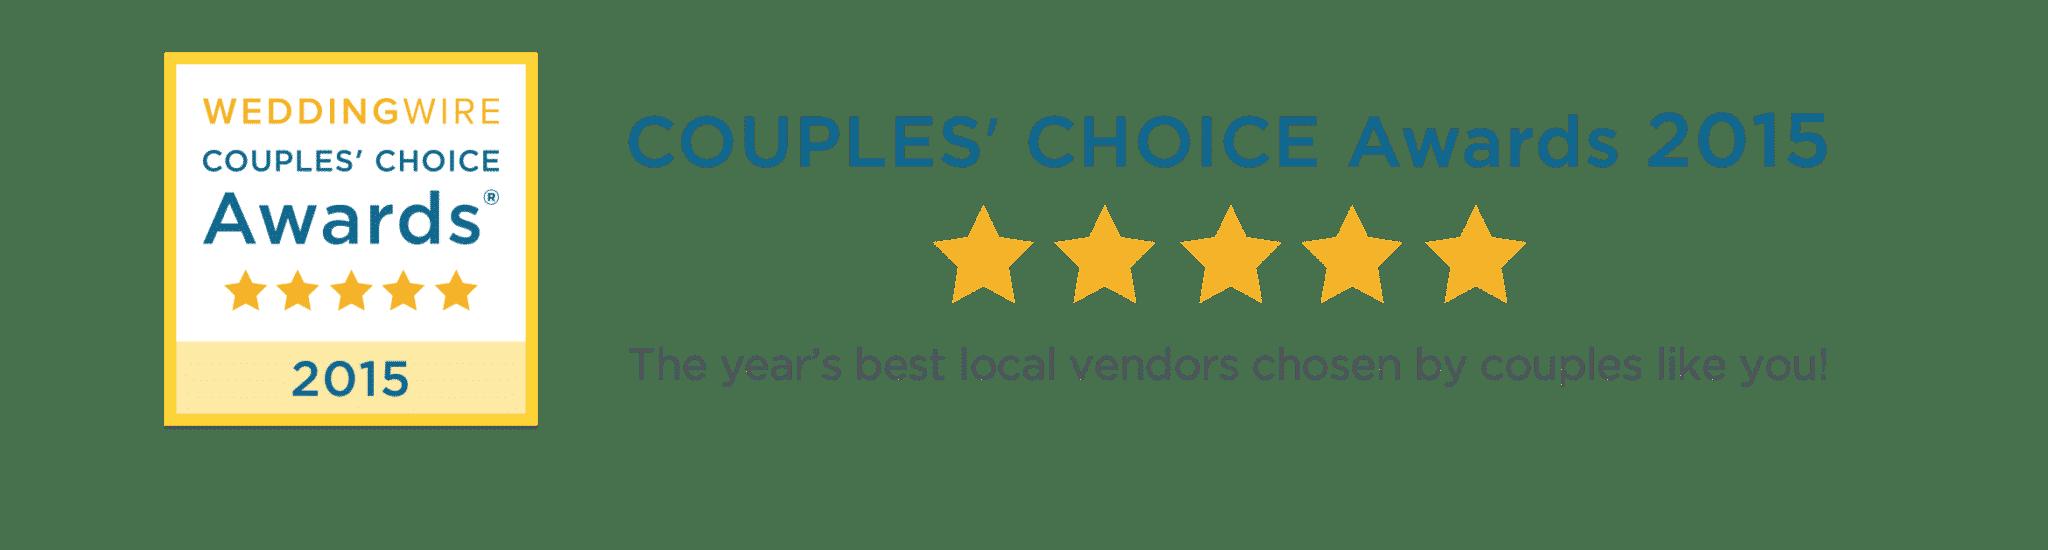 2015 WeddingWire Couples' Choice Award®